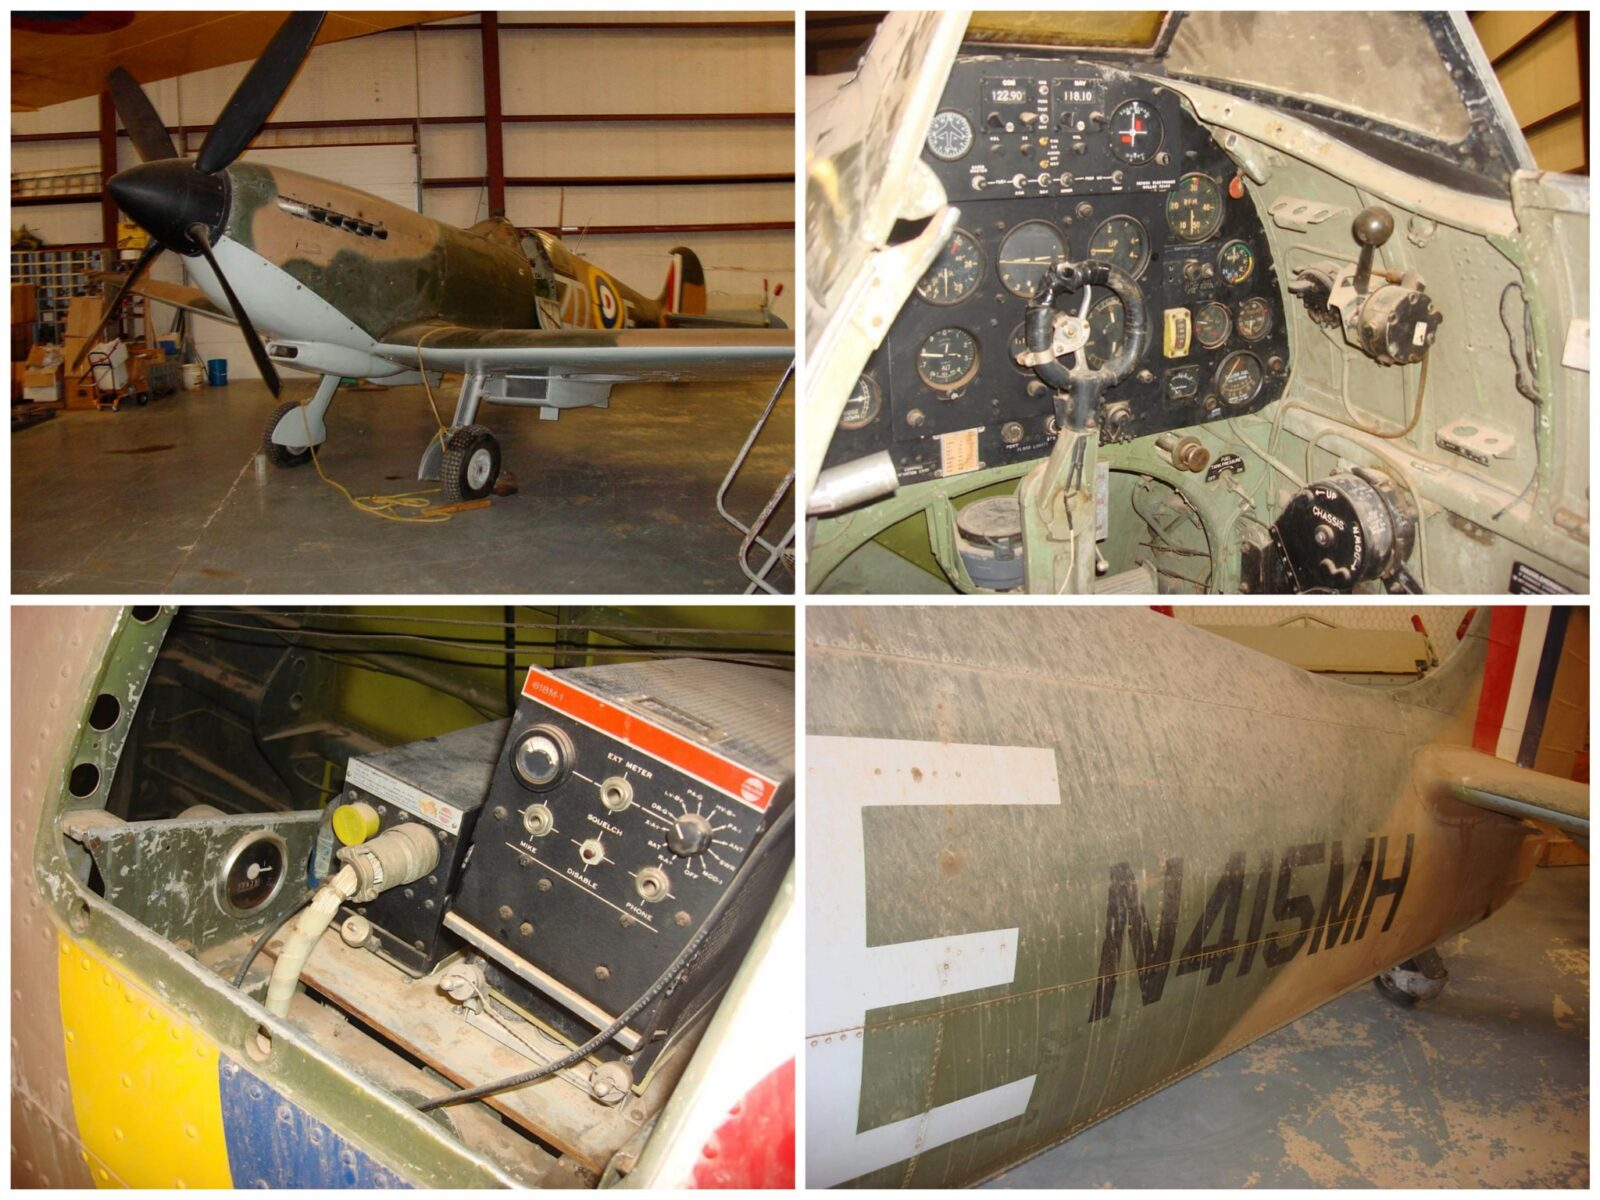 Spitfire Plane 2 1600x1200 - Spitfire Barn Find